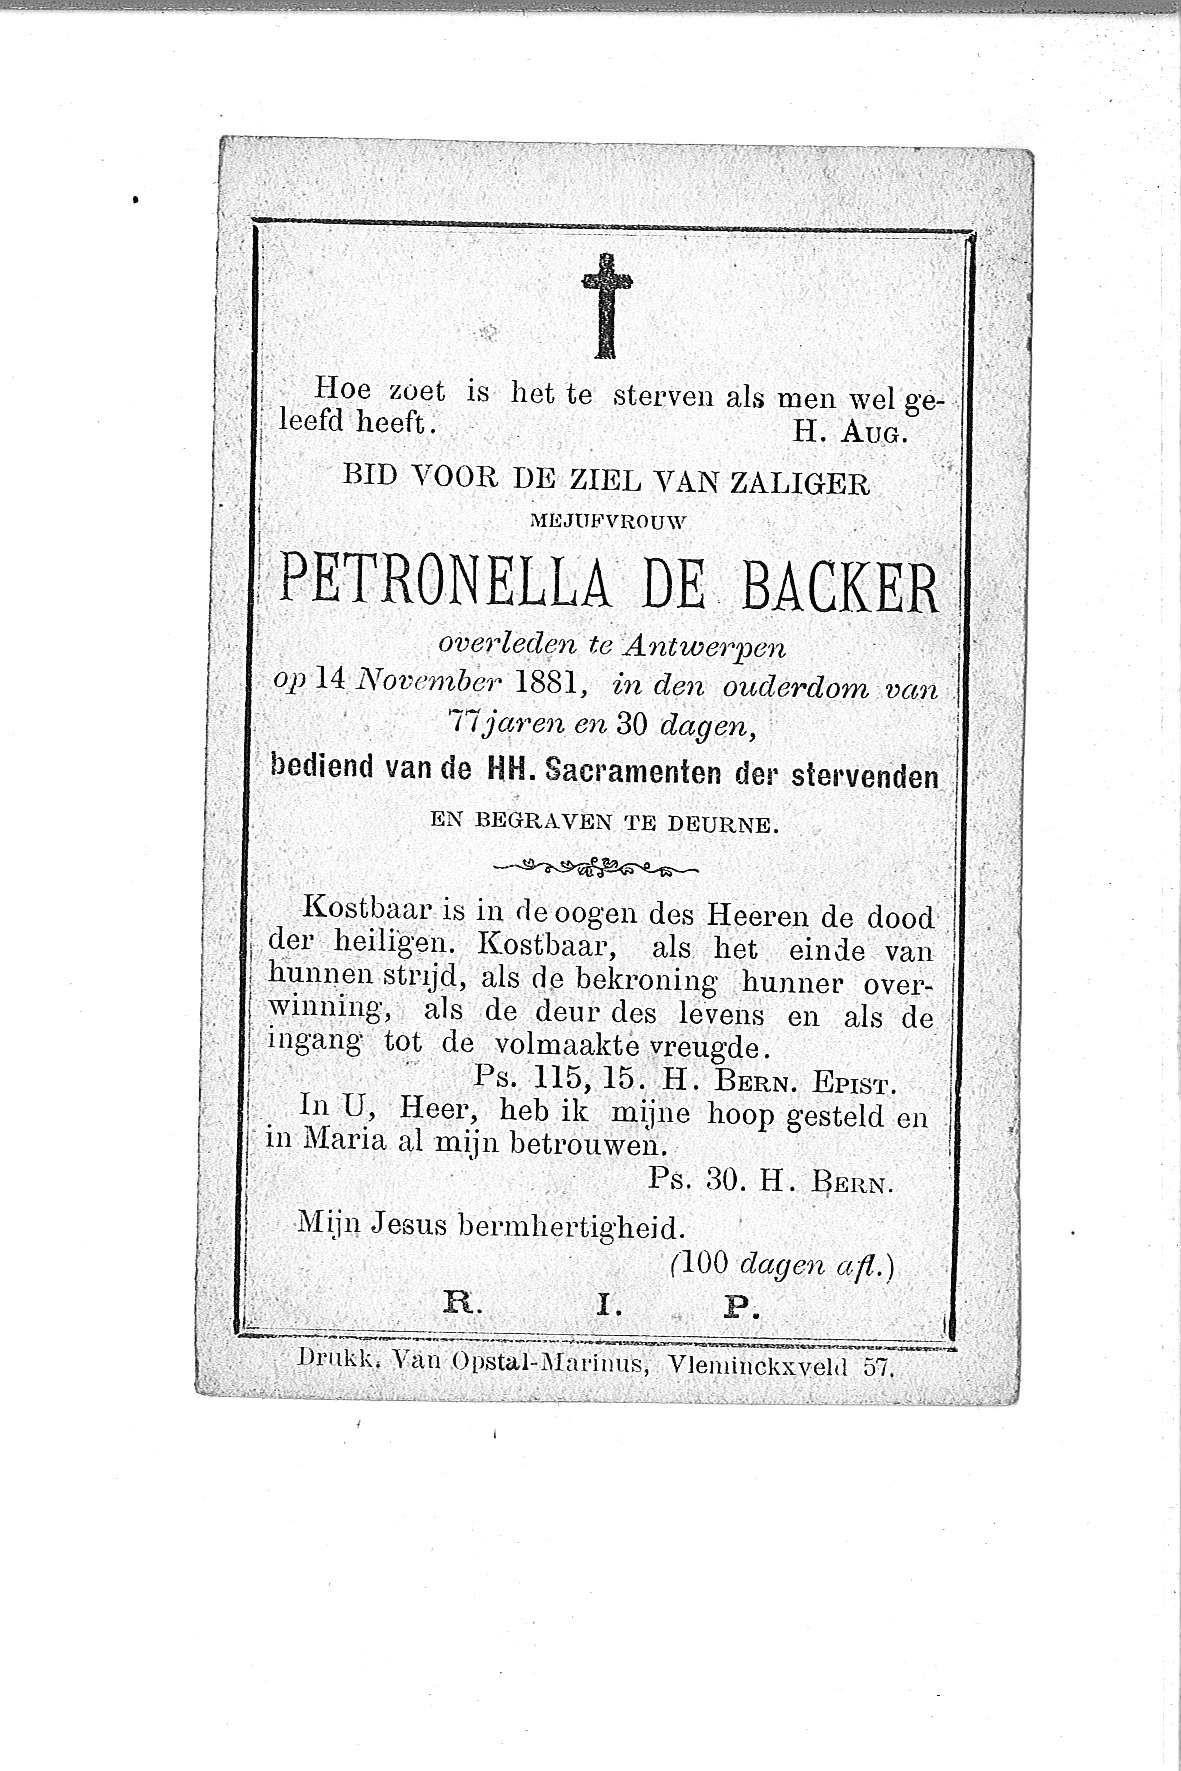 Petronella (1881) 20120529153758_00019.jpg